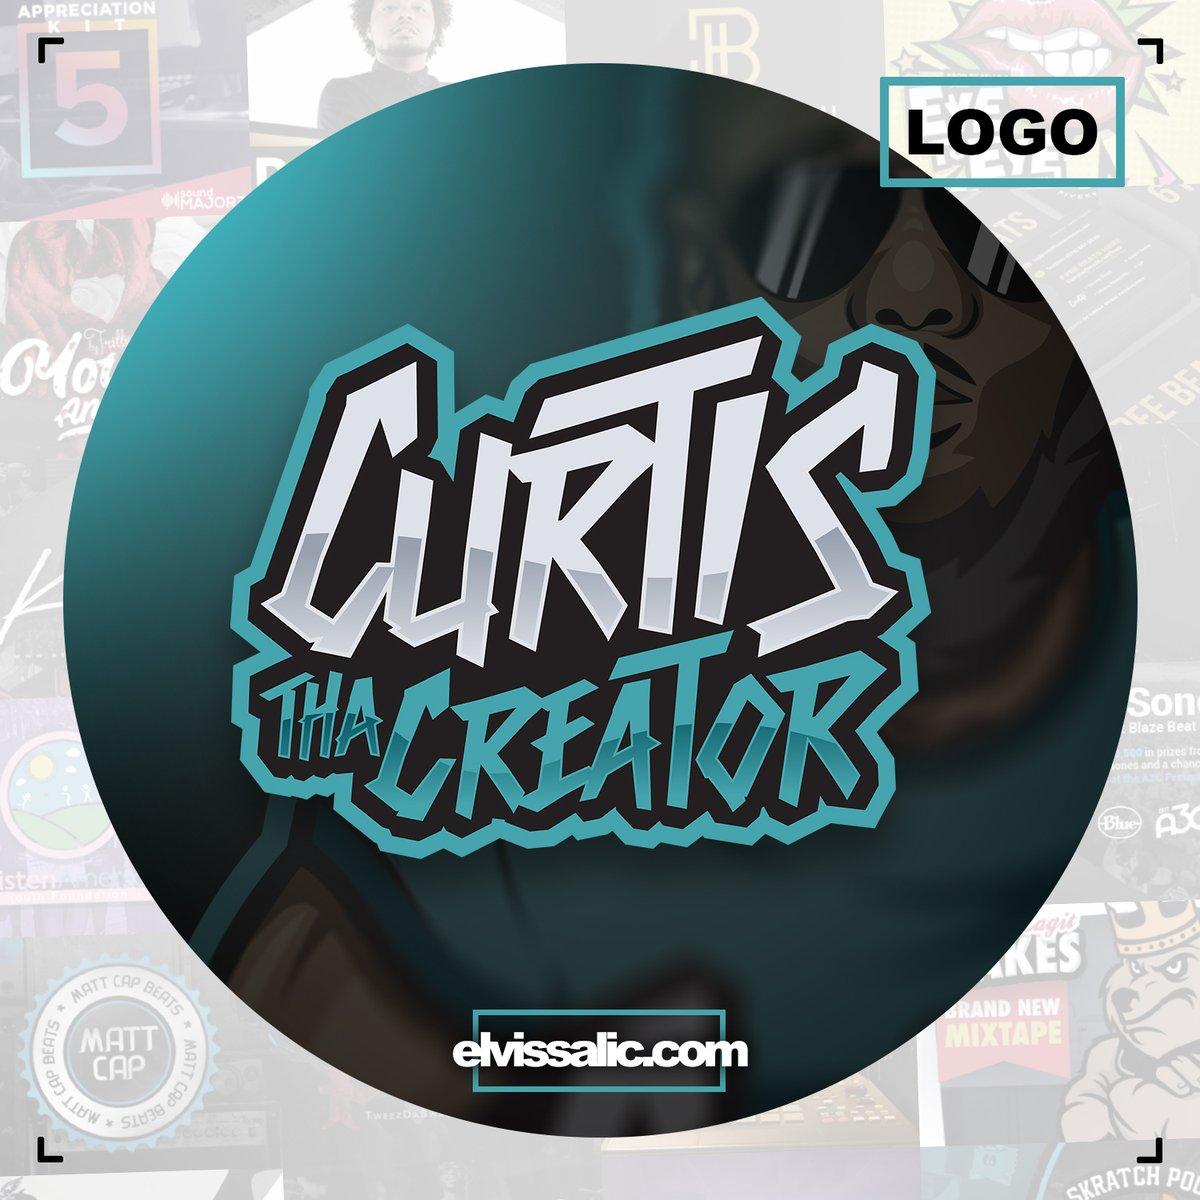 Logo development for Curtis Tha Creator @curtisthacreator  #graphic #design  #illustrator #vectordesign #brandingdesign  #logoinspiration #logodesigner #logocreation #photoshop #illustratordesign #entrepreneur #logocharacter #logomascot #beatmaker #producer #producerlogo https://t.co/A8B0WwOJPF